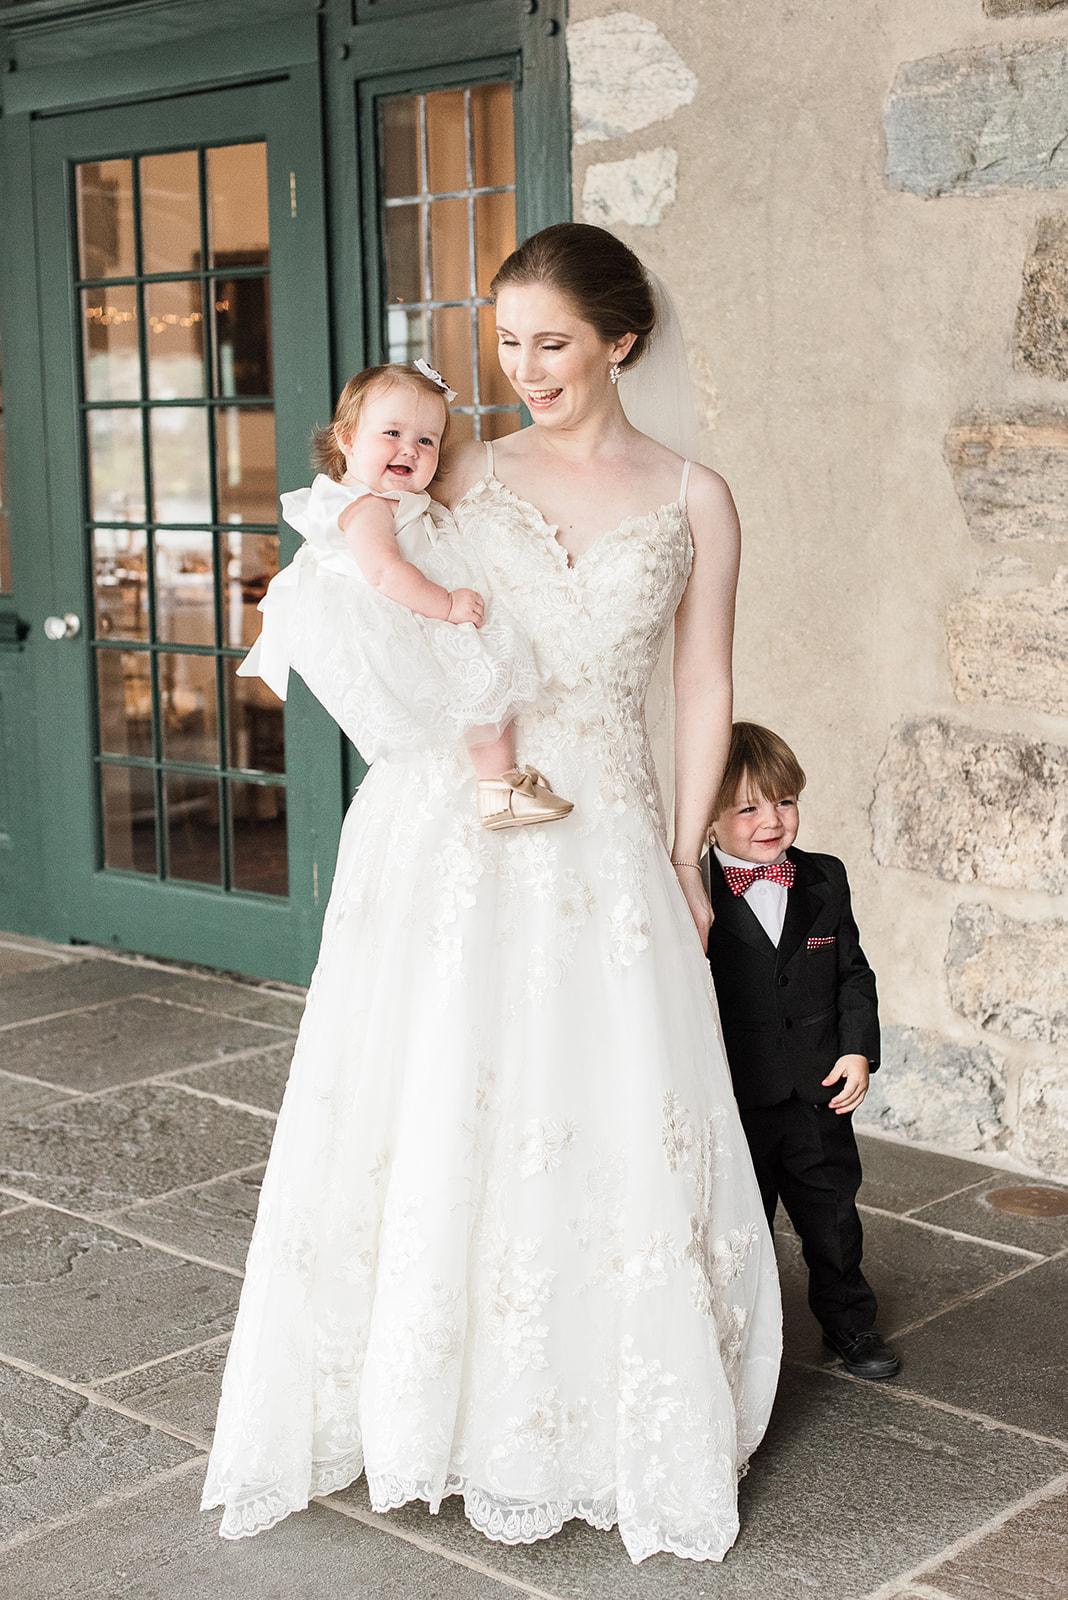 Lloyd+Wedding+by+Michelle+Lange+Photography-622.jpg